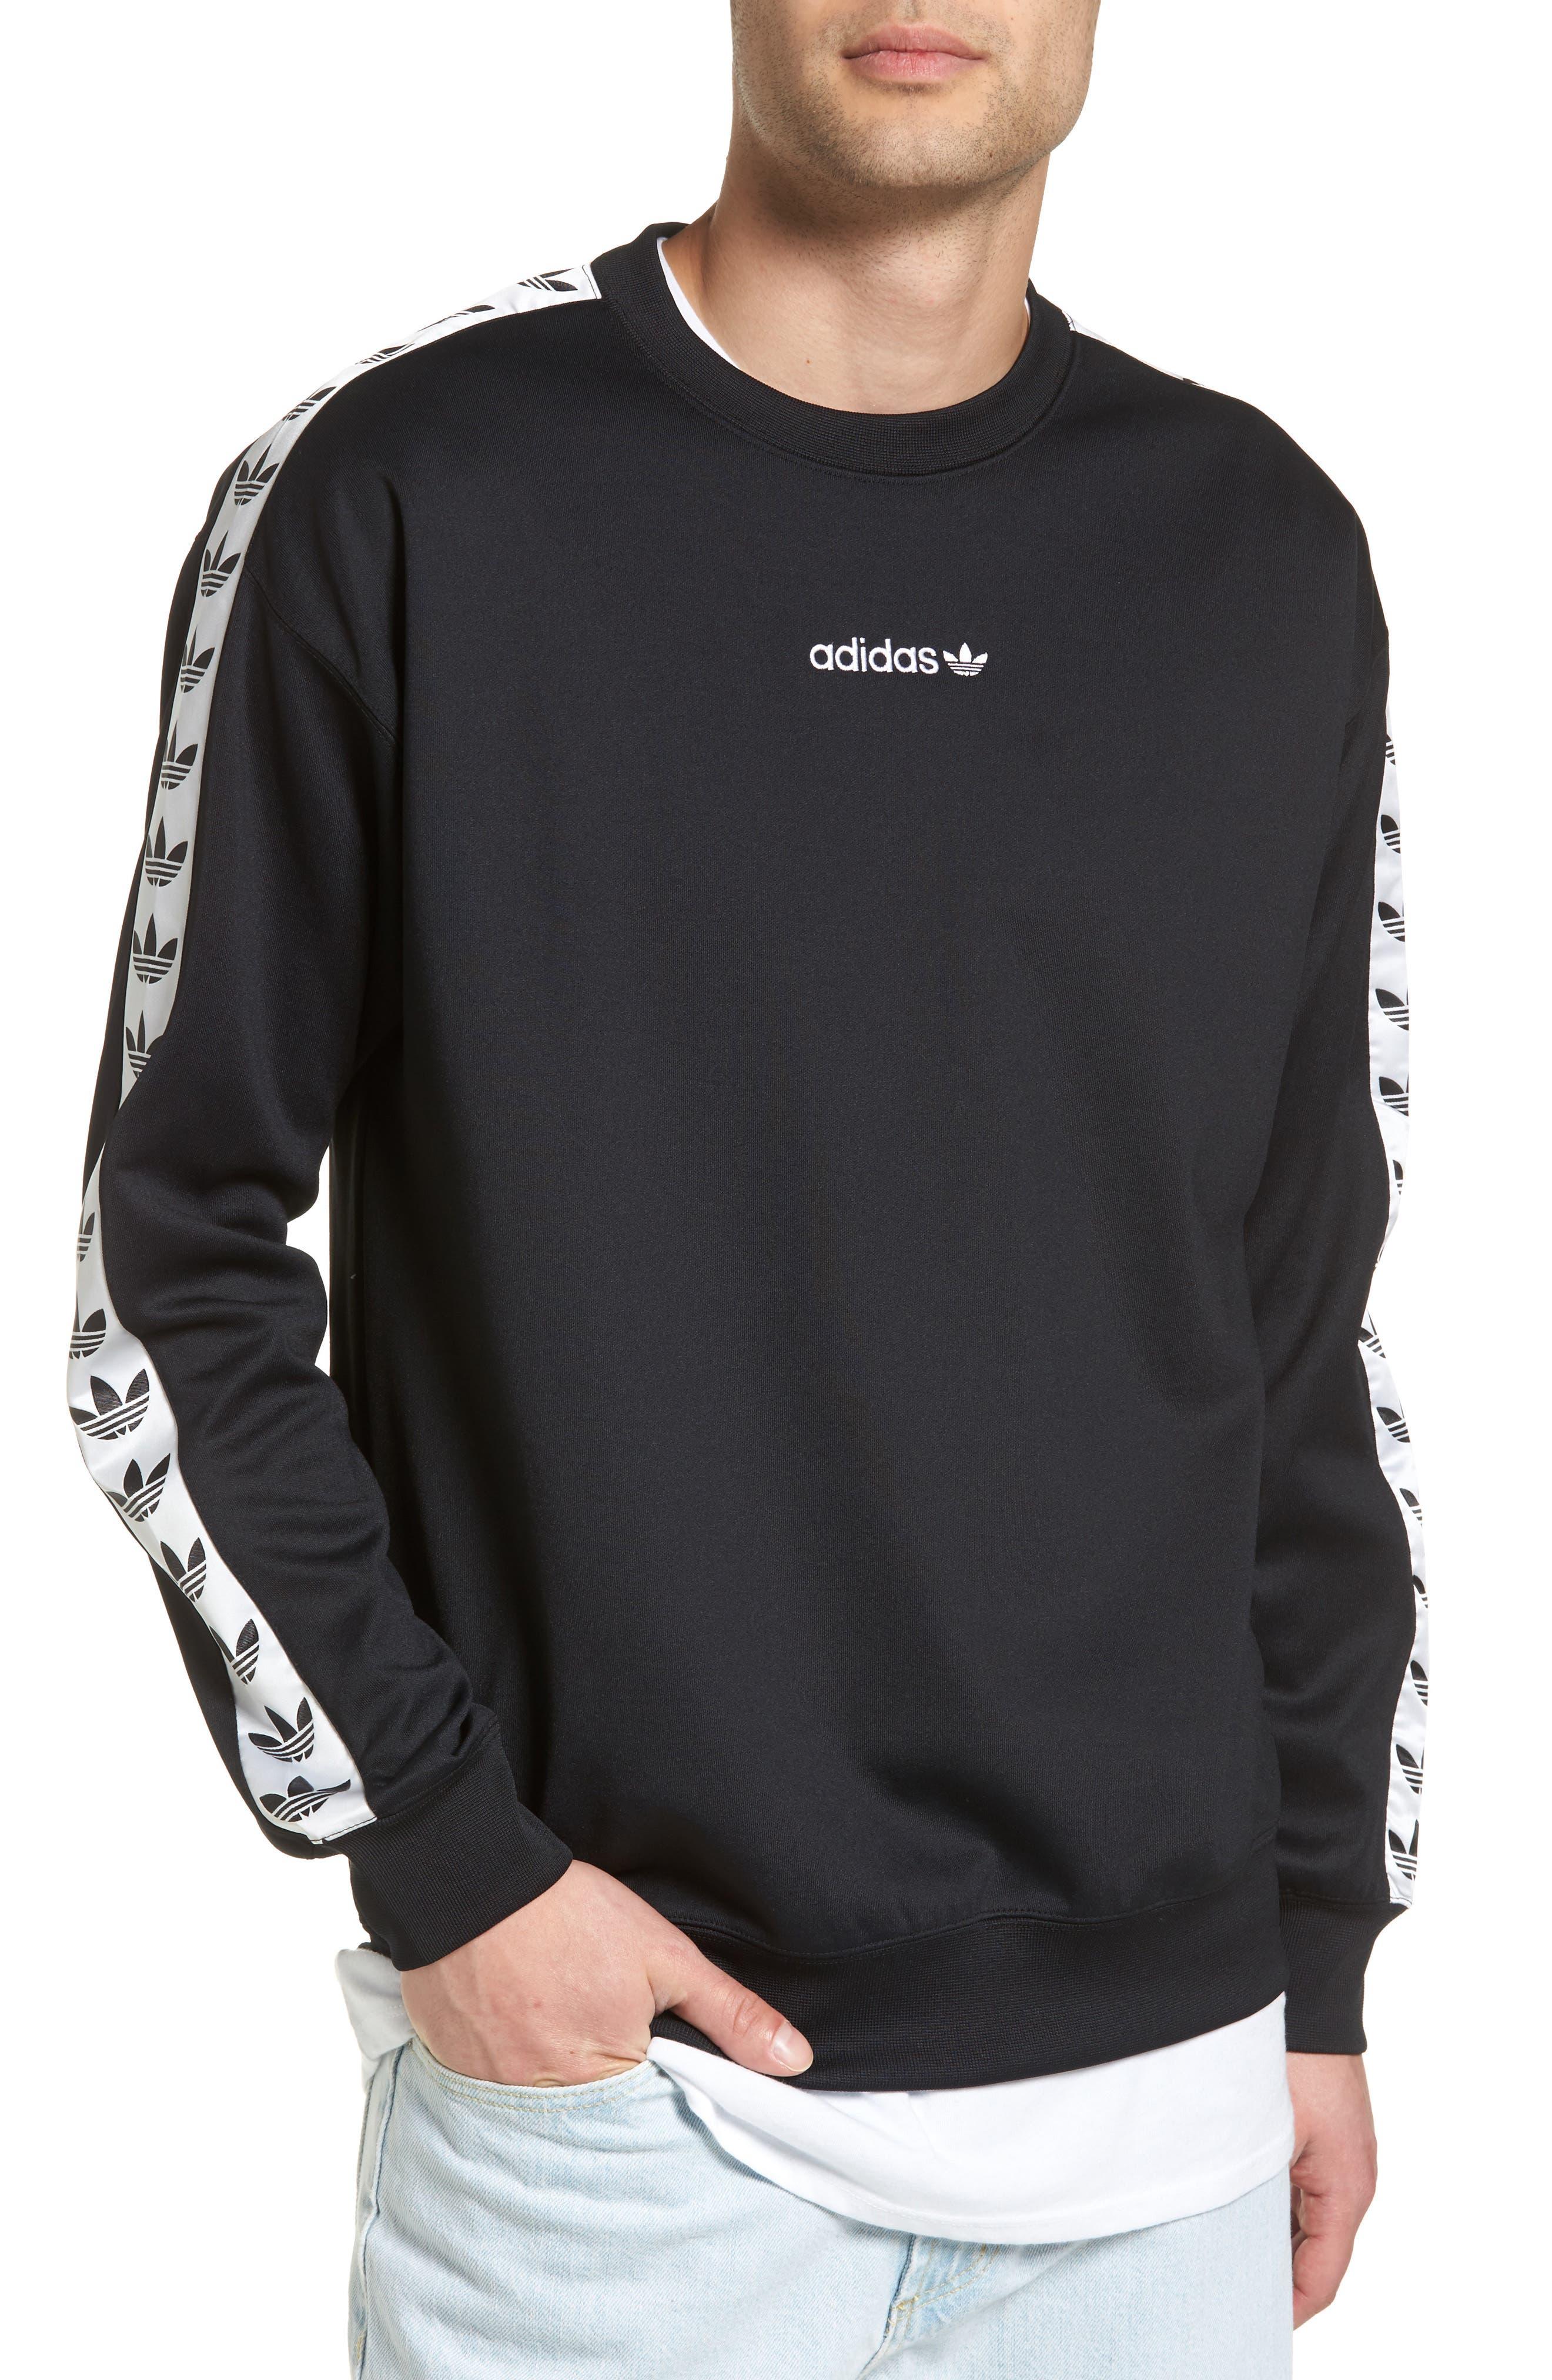 Alternate Image 1 Selected - adidas Originals TNT Trefoil Sweatshirt